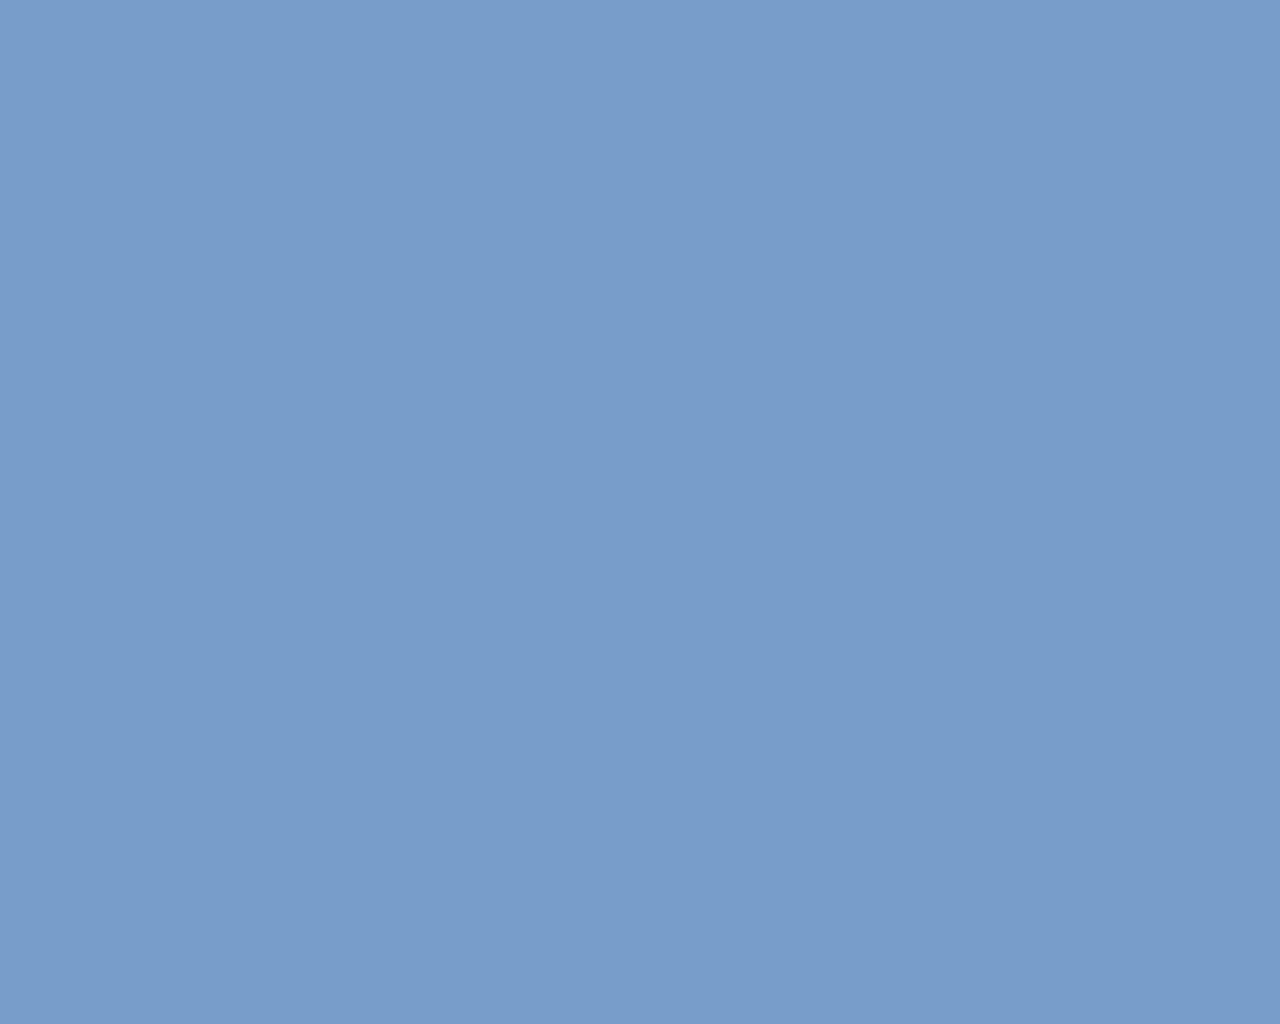 Solid pastel blue background